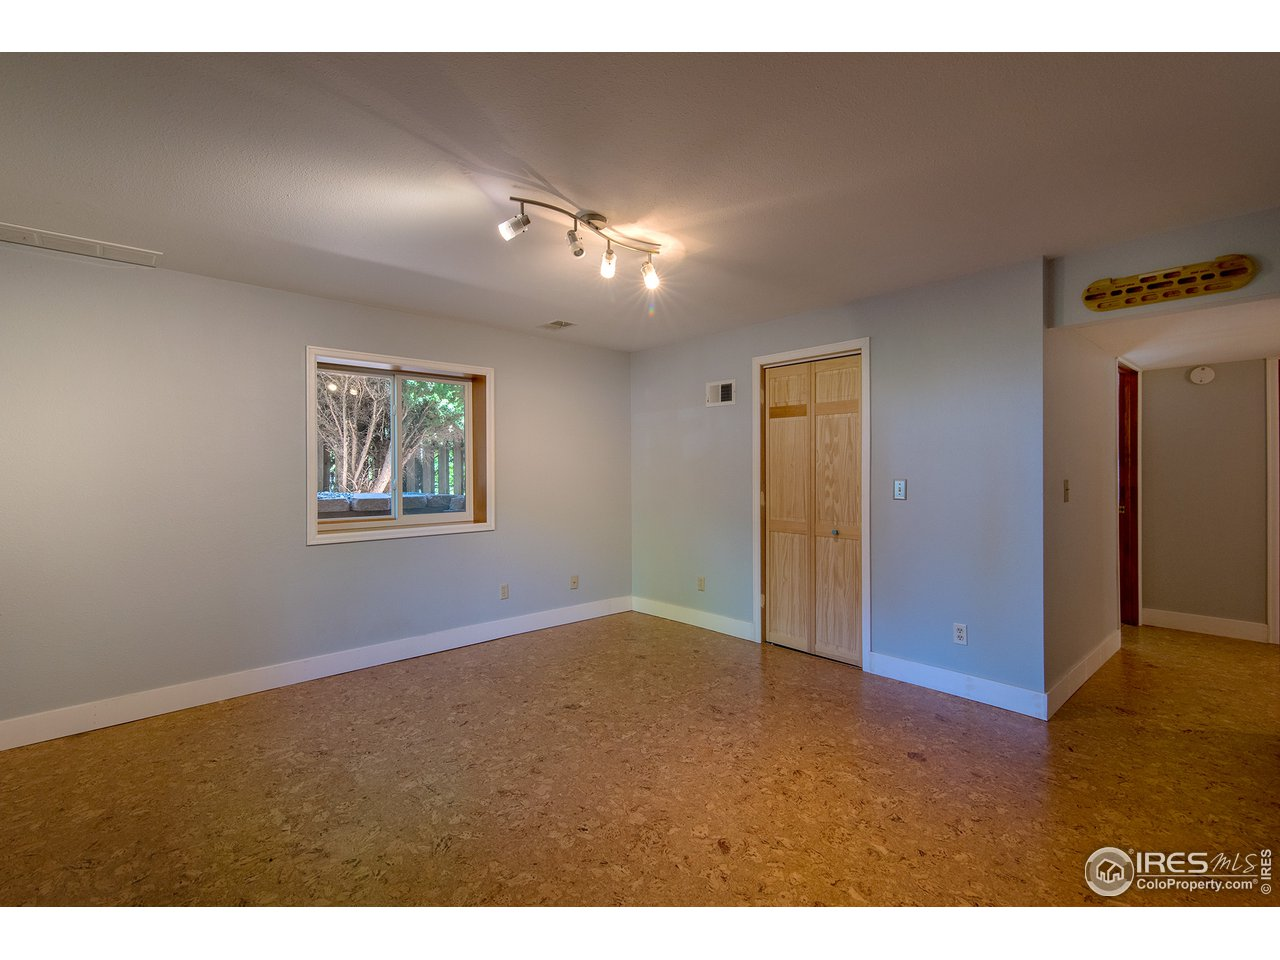 Lower Flex Room